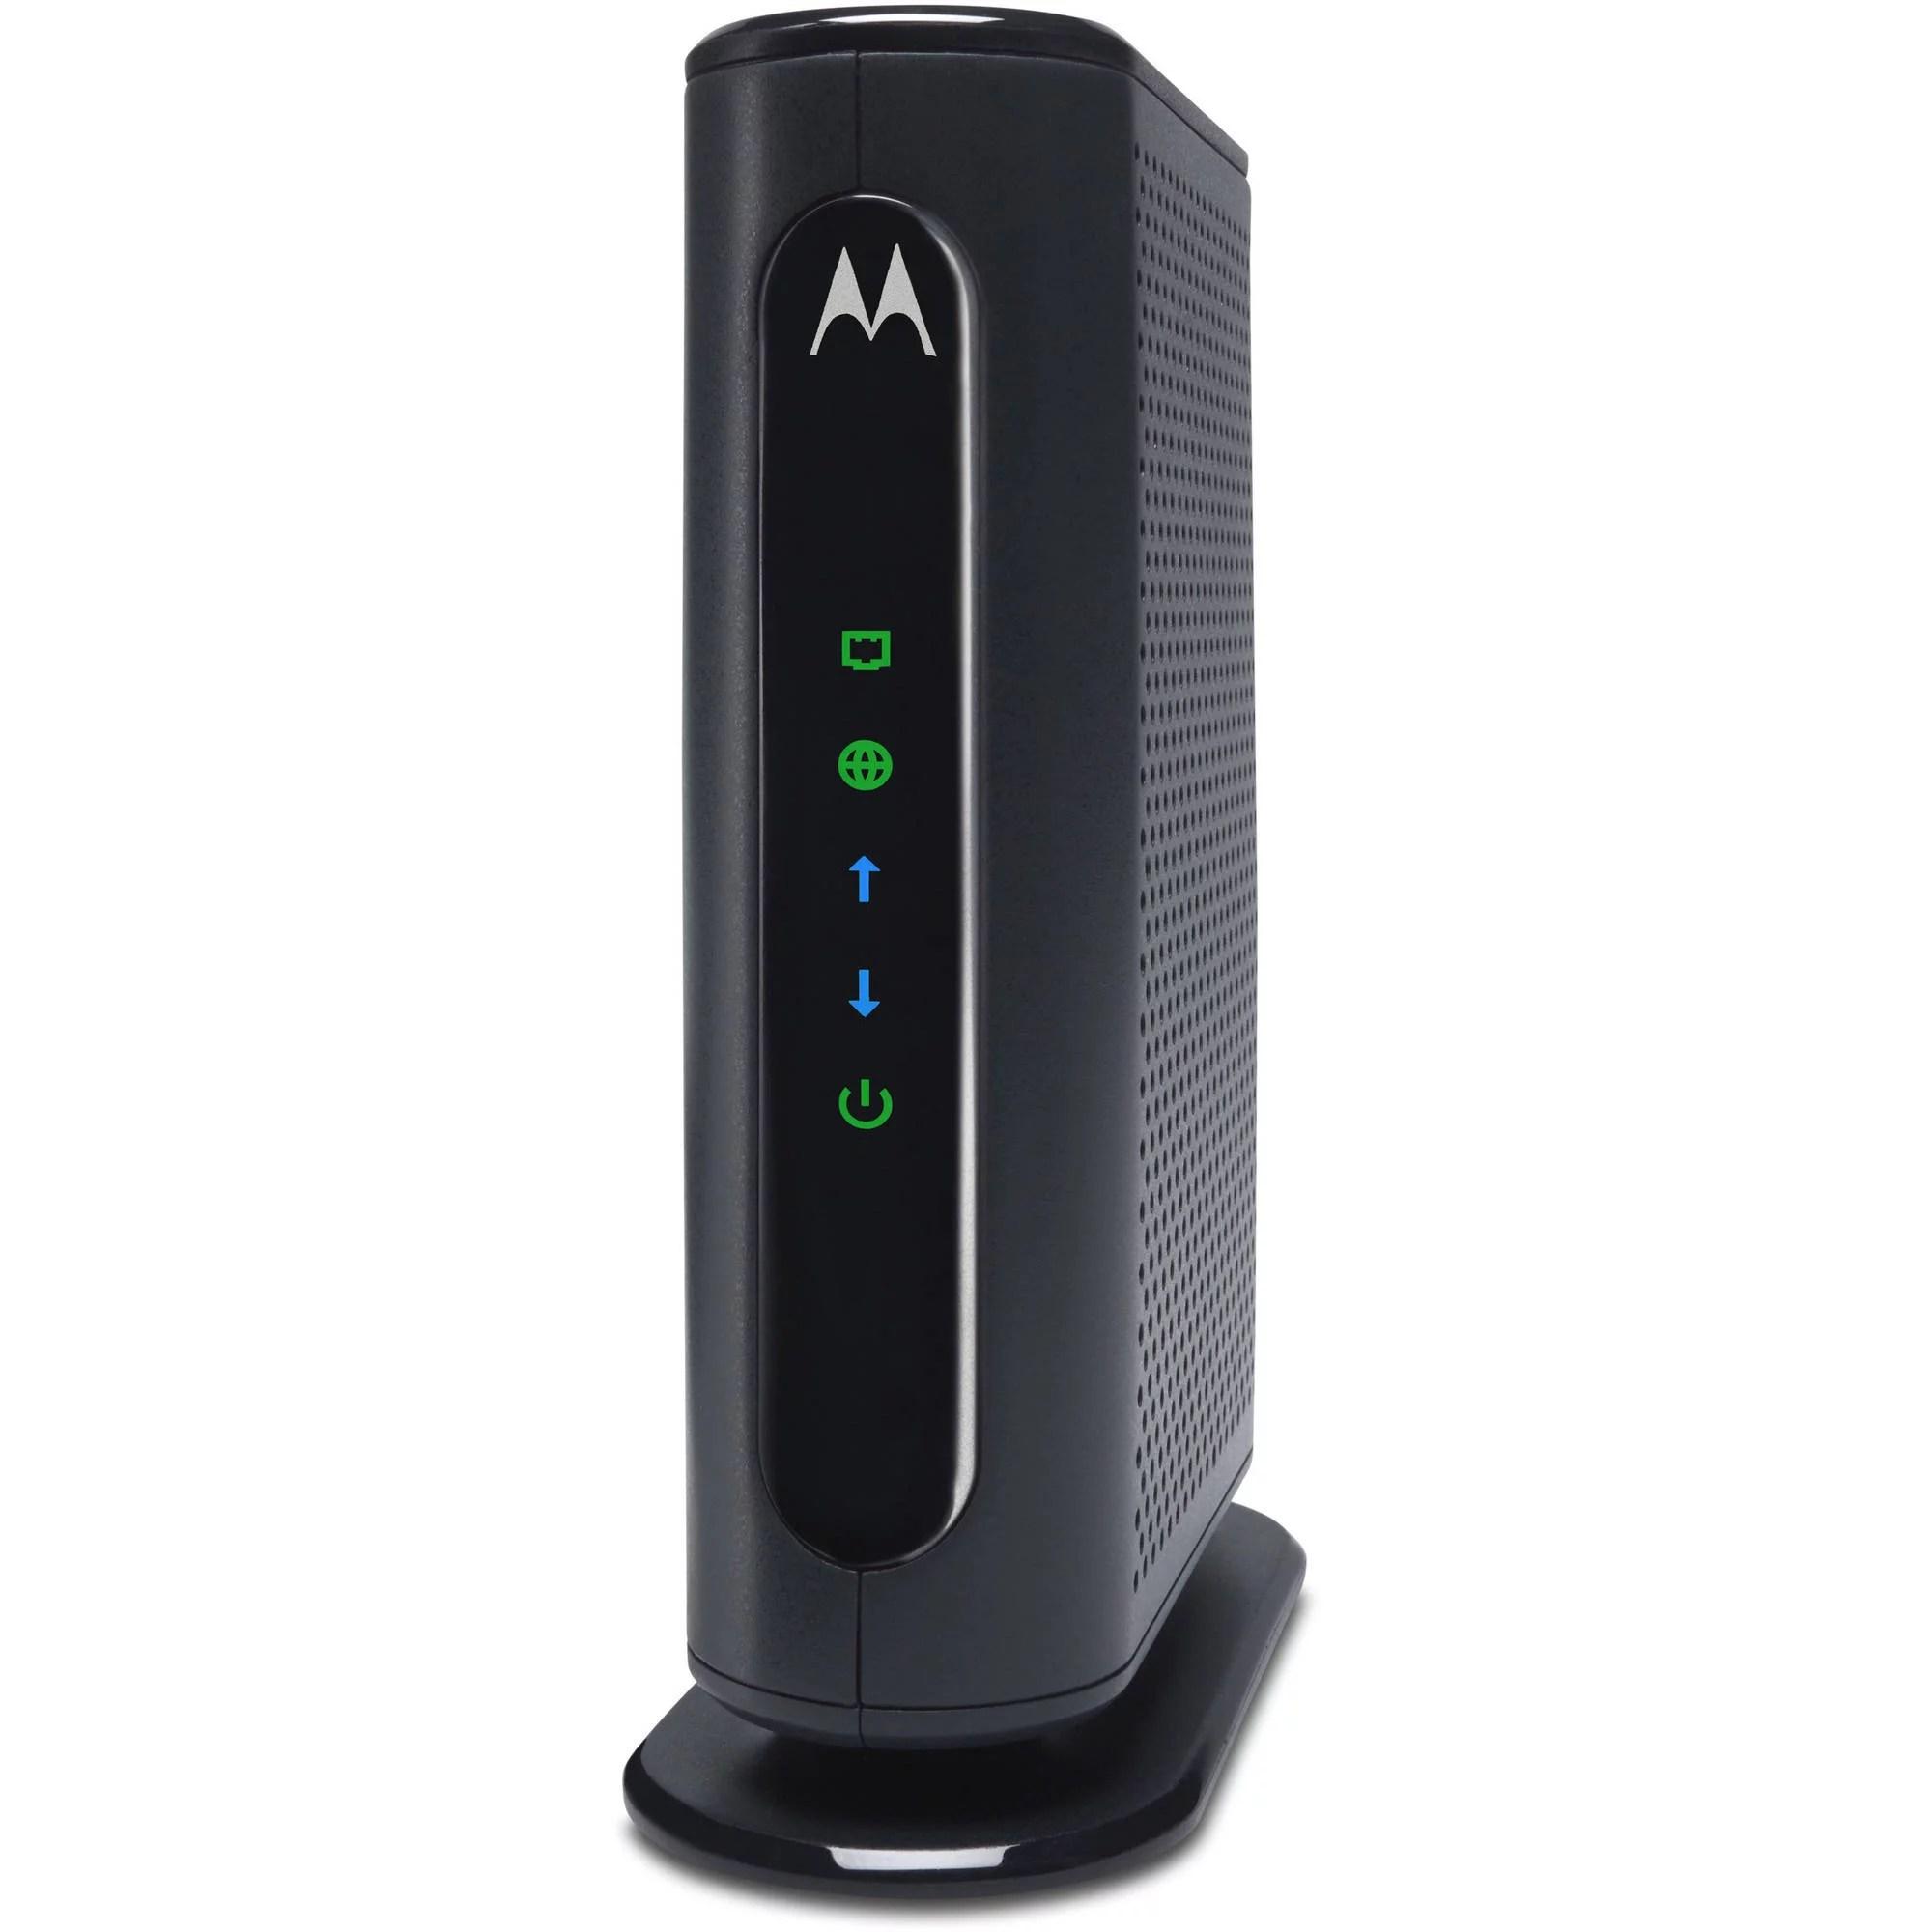 hight resolution of motorola mb7220 modem